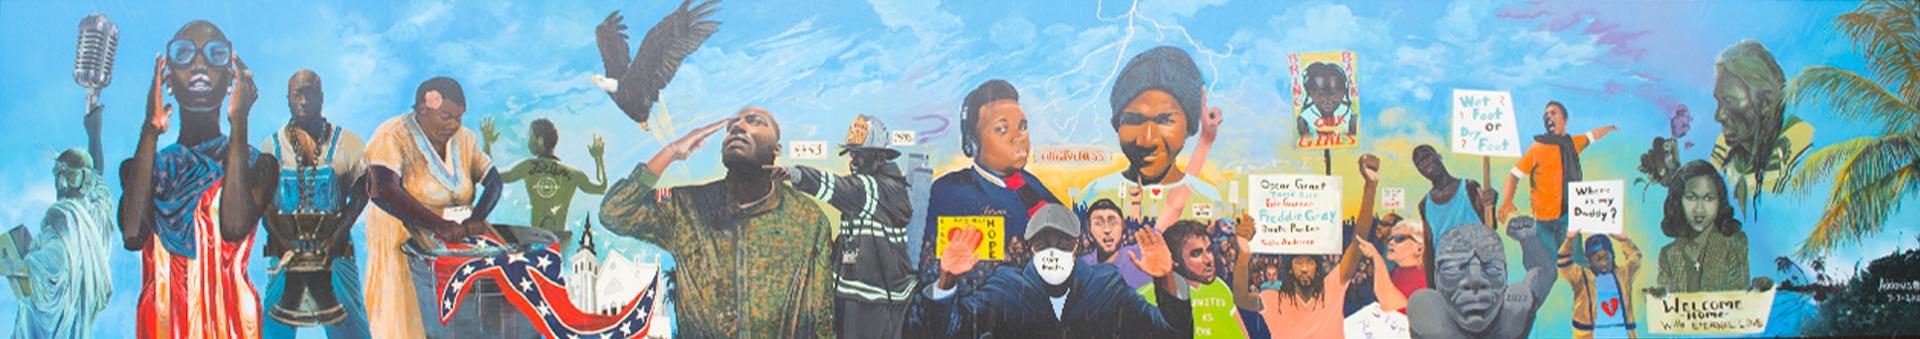 Thunder and Enlightening Mural | OneUnited Bank